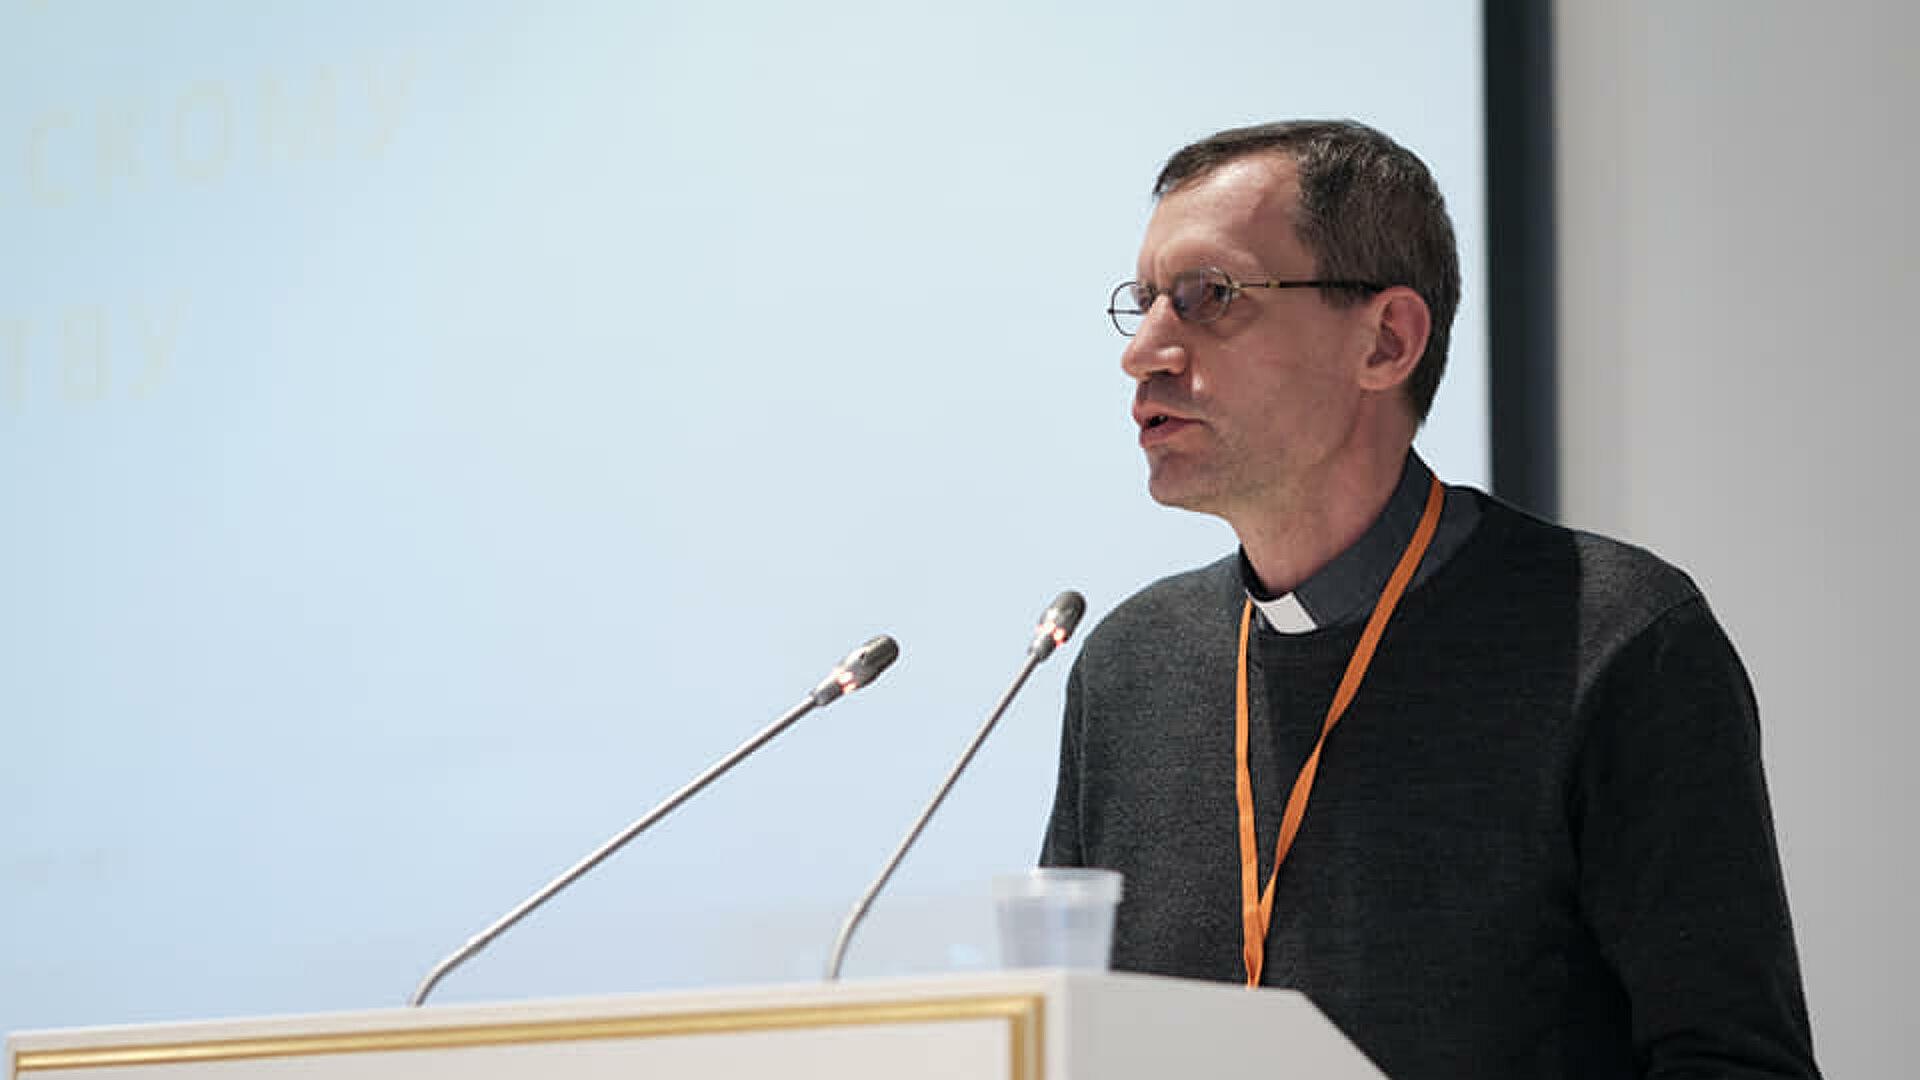 Россия будет представлена на конференции о защите детей от насилия